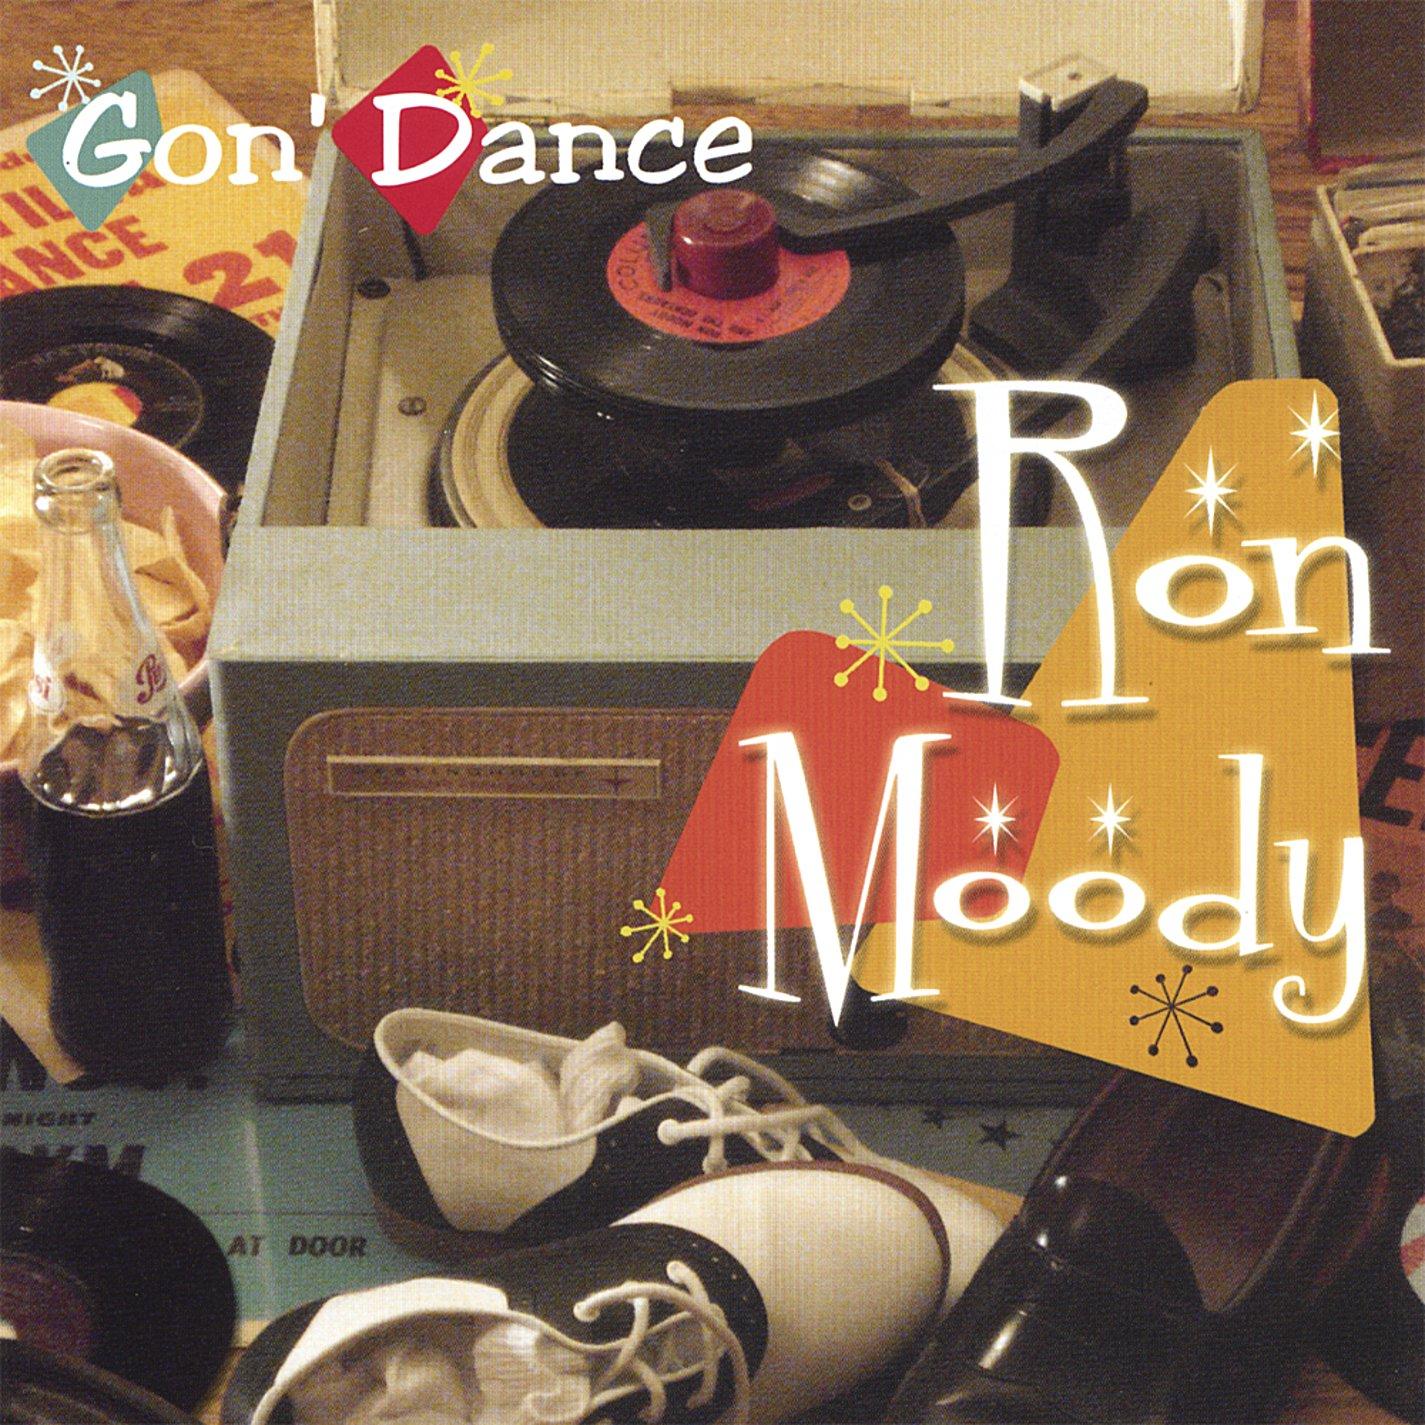 Gondance: Ron Moody: Amazon.es: Música